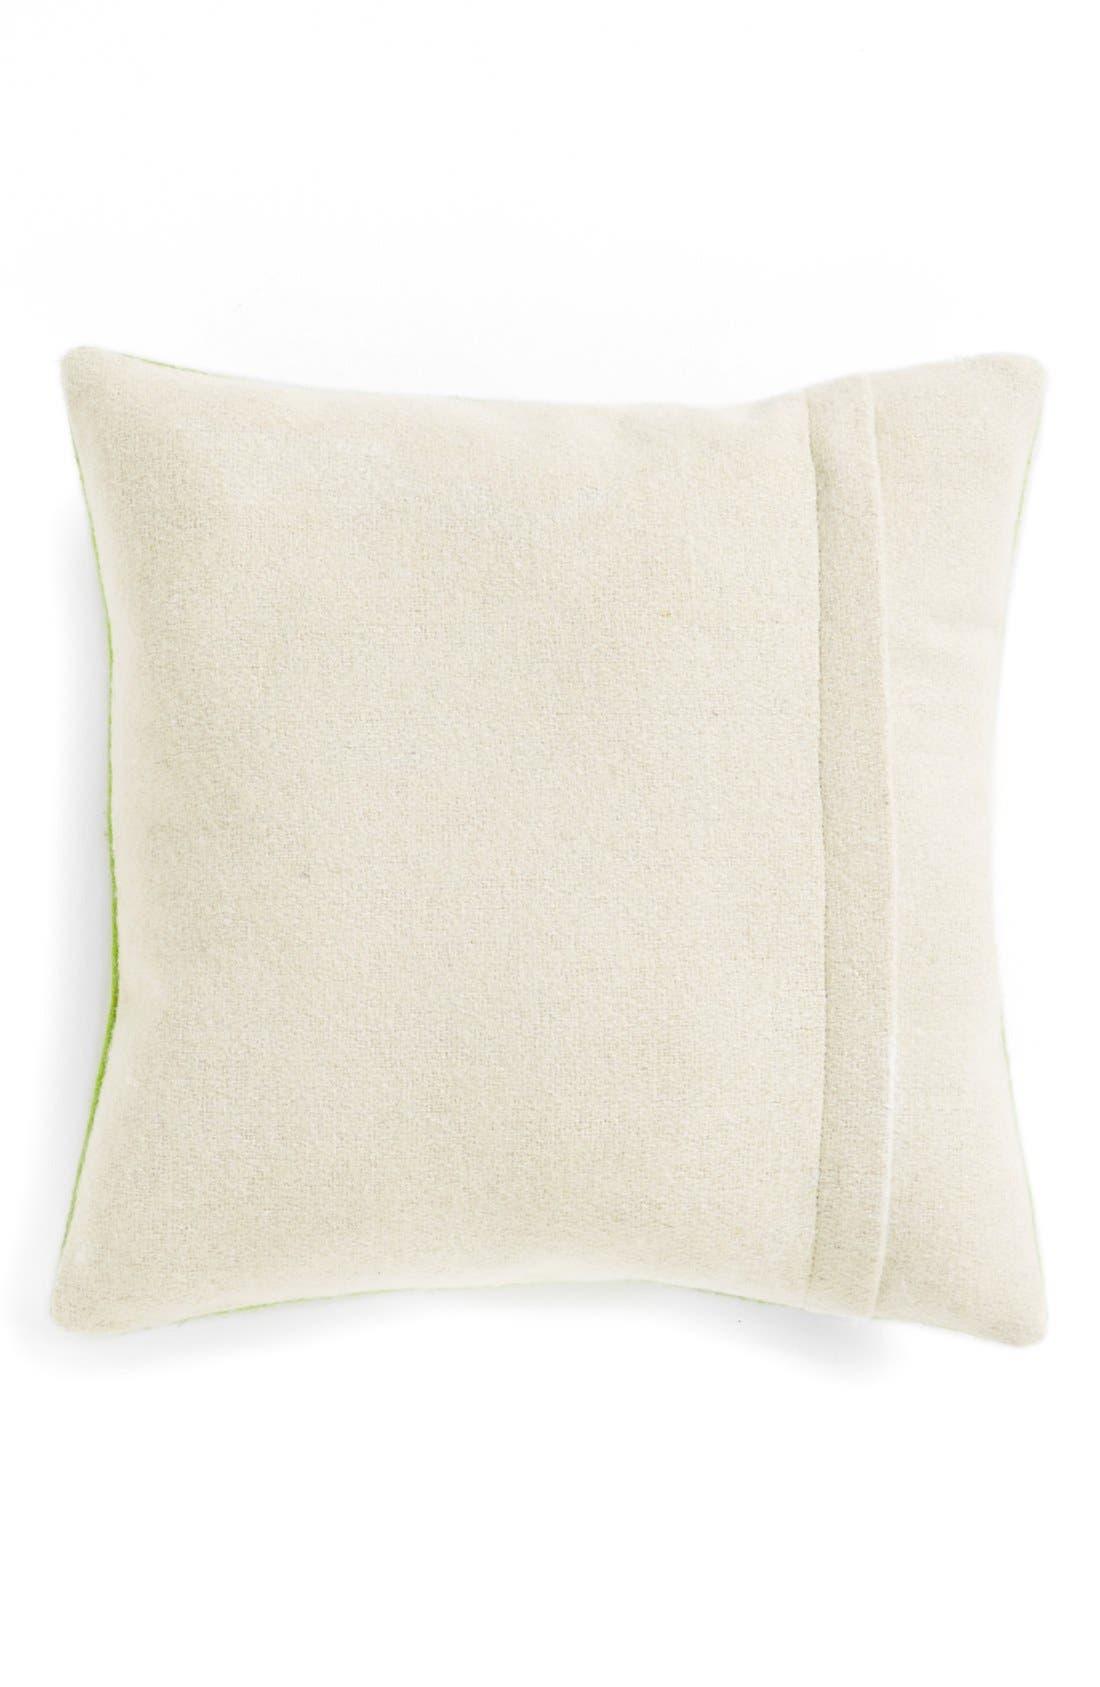 Alternate Image 2  - Amity Home 'Turtle' Decorative Pillow